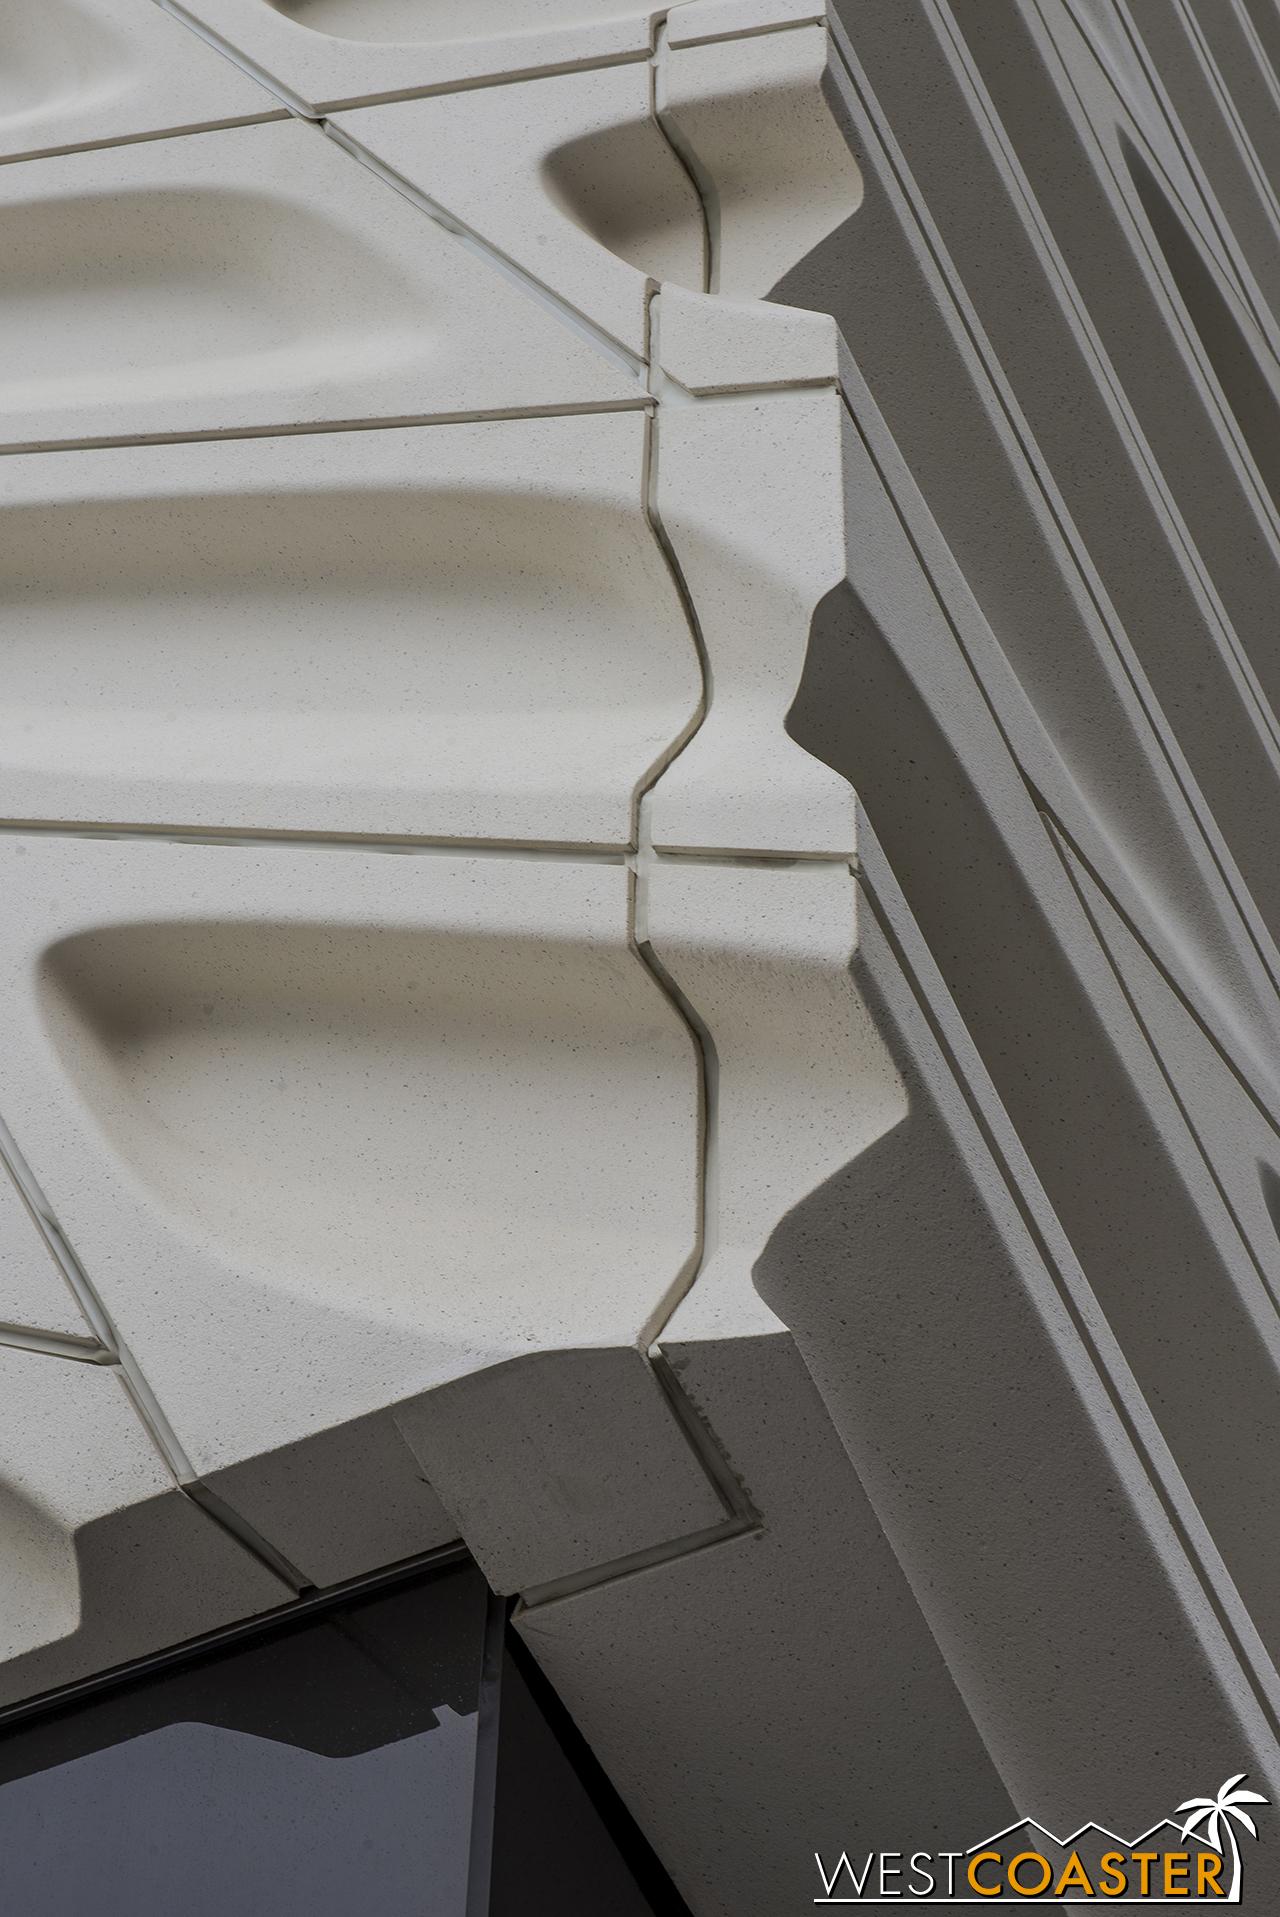 Nerdy architecture corner detail photo.